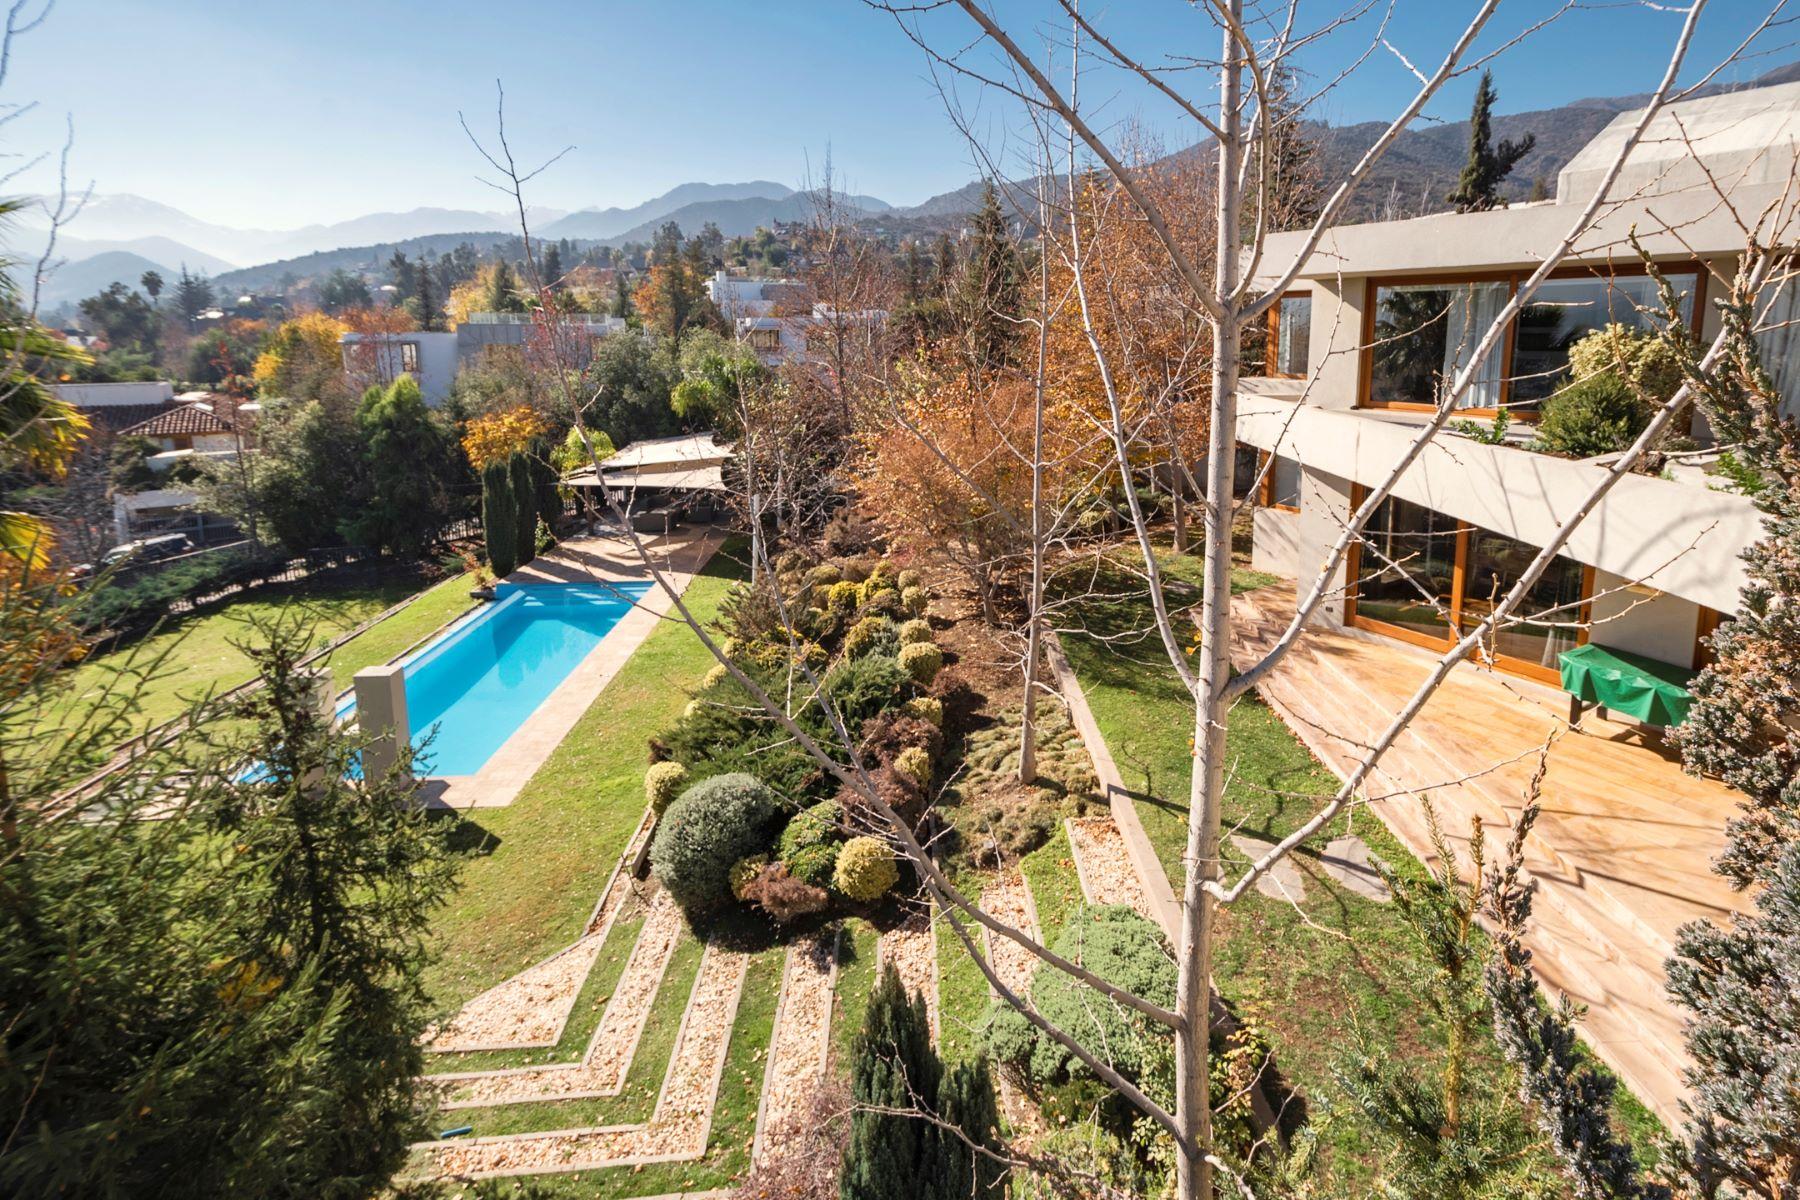 Single Family Homes pour l Vente à Extraordinary Home in Exclusive Gated Community. Las Condes, Santiago, Region Metropolitana De Santiago Chili